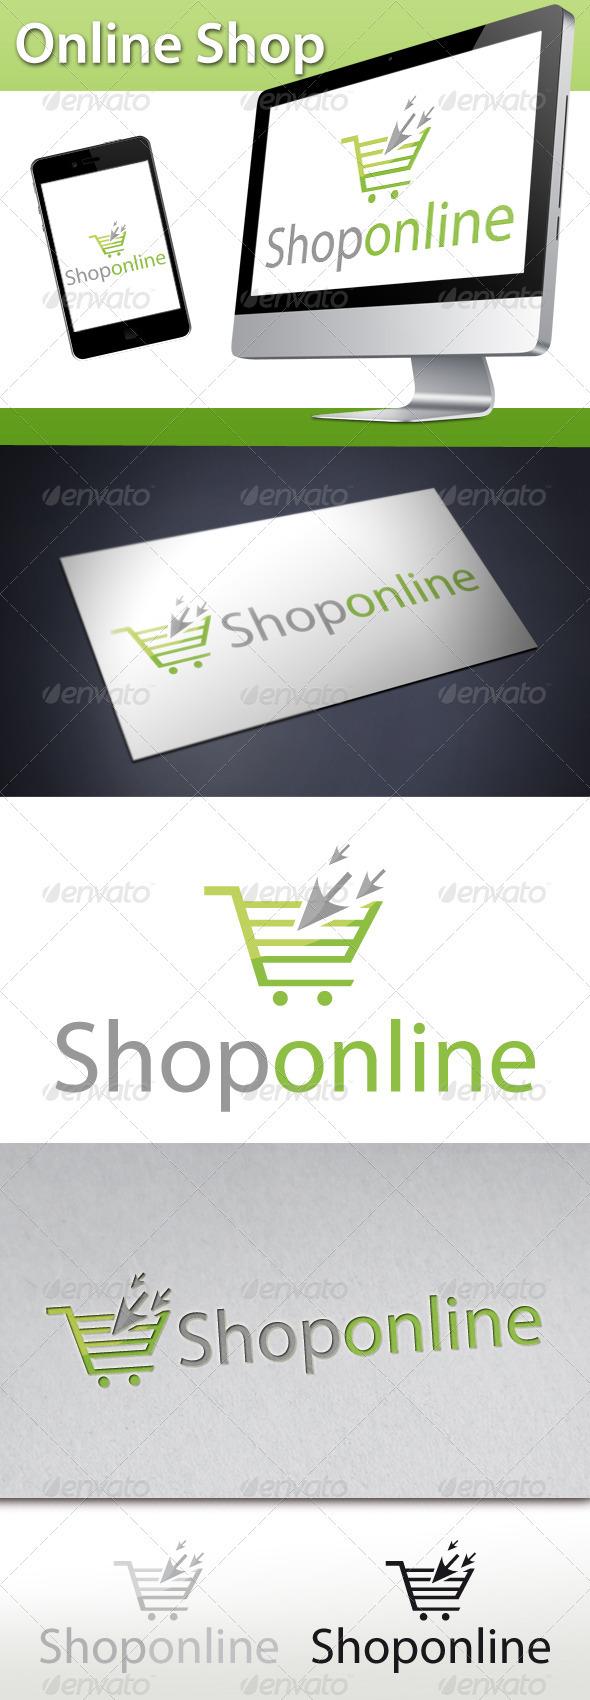 GraphicRiver Online Shop Click Cart Logo 3279015